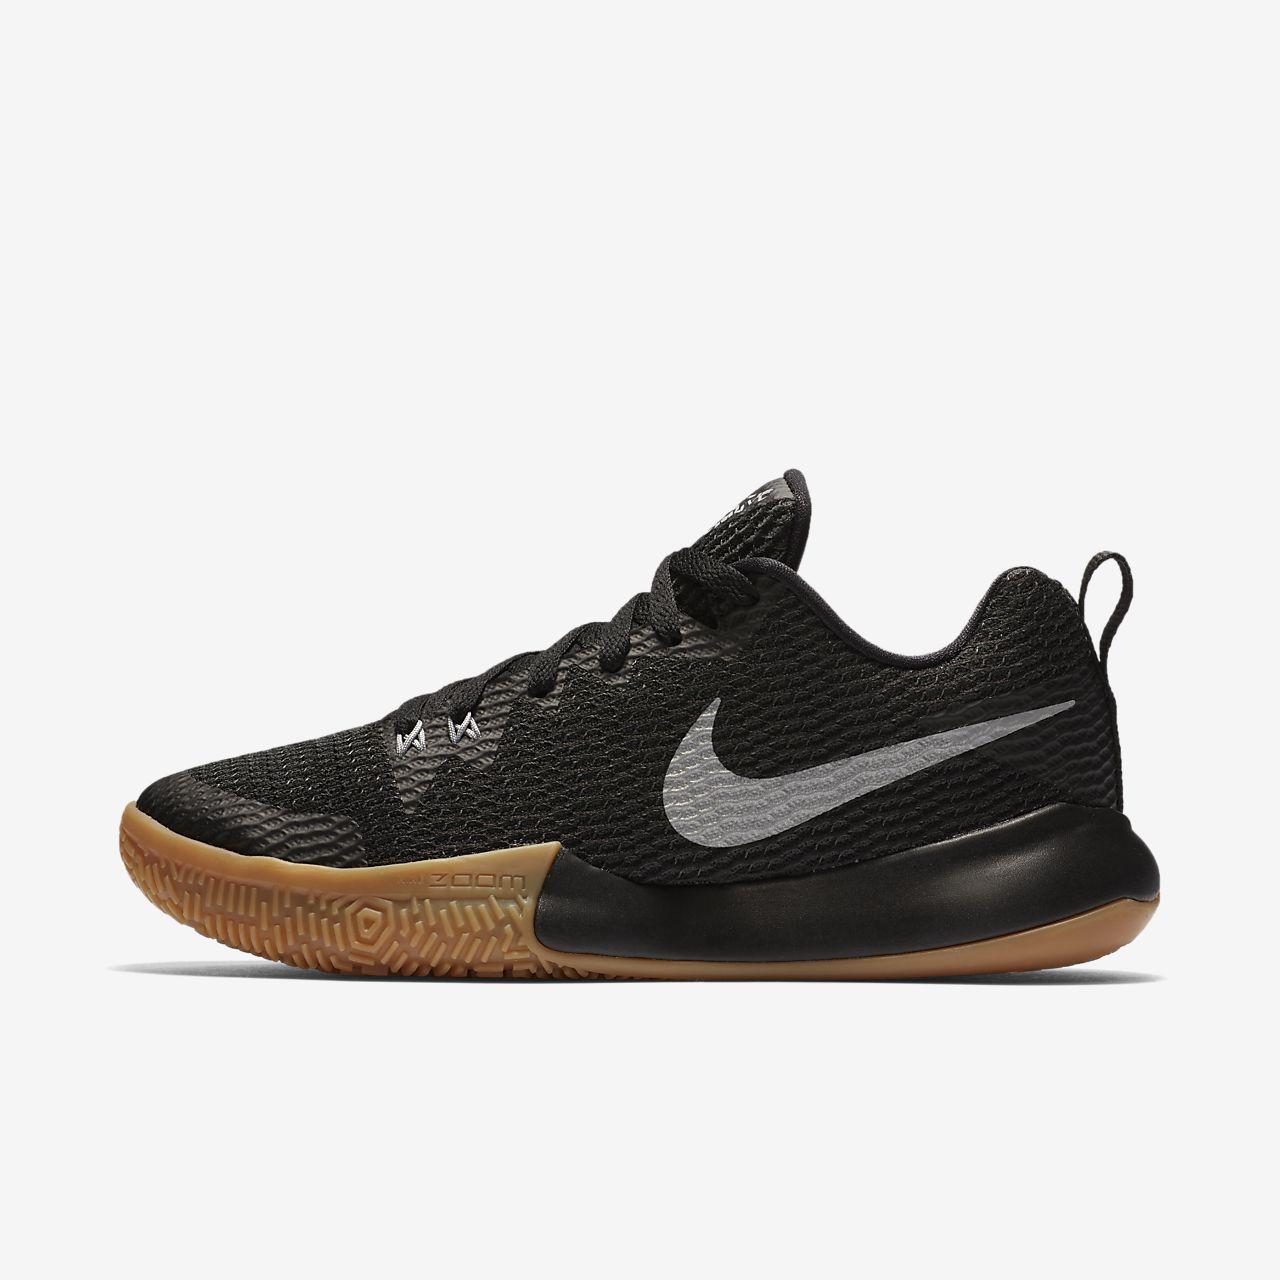 official photos 7df64 55499 ... Nike Zoom Live II Women s Basketball Shoe